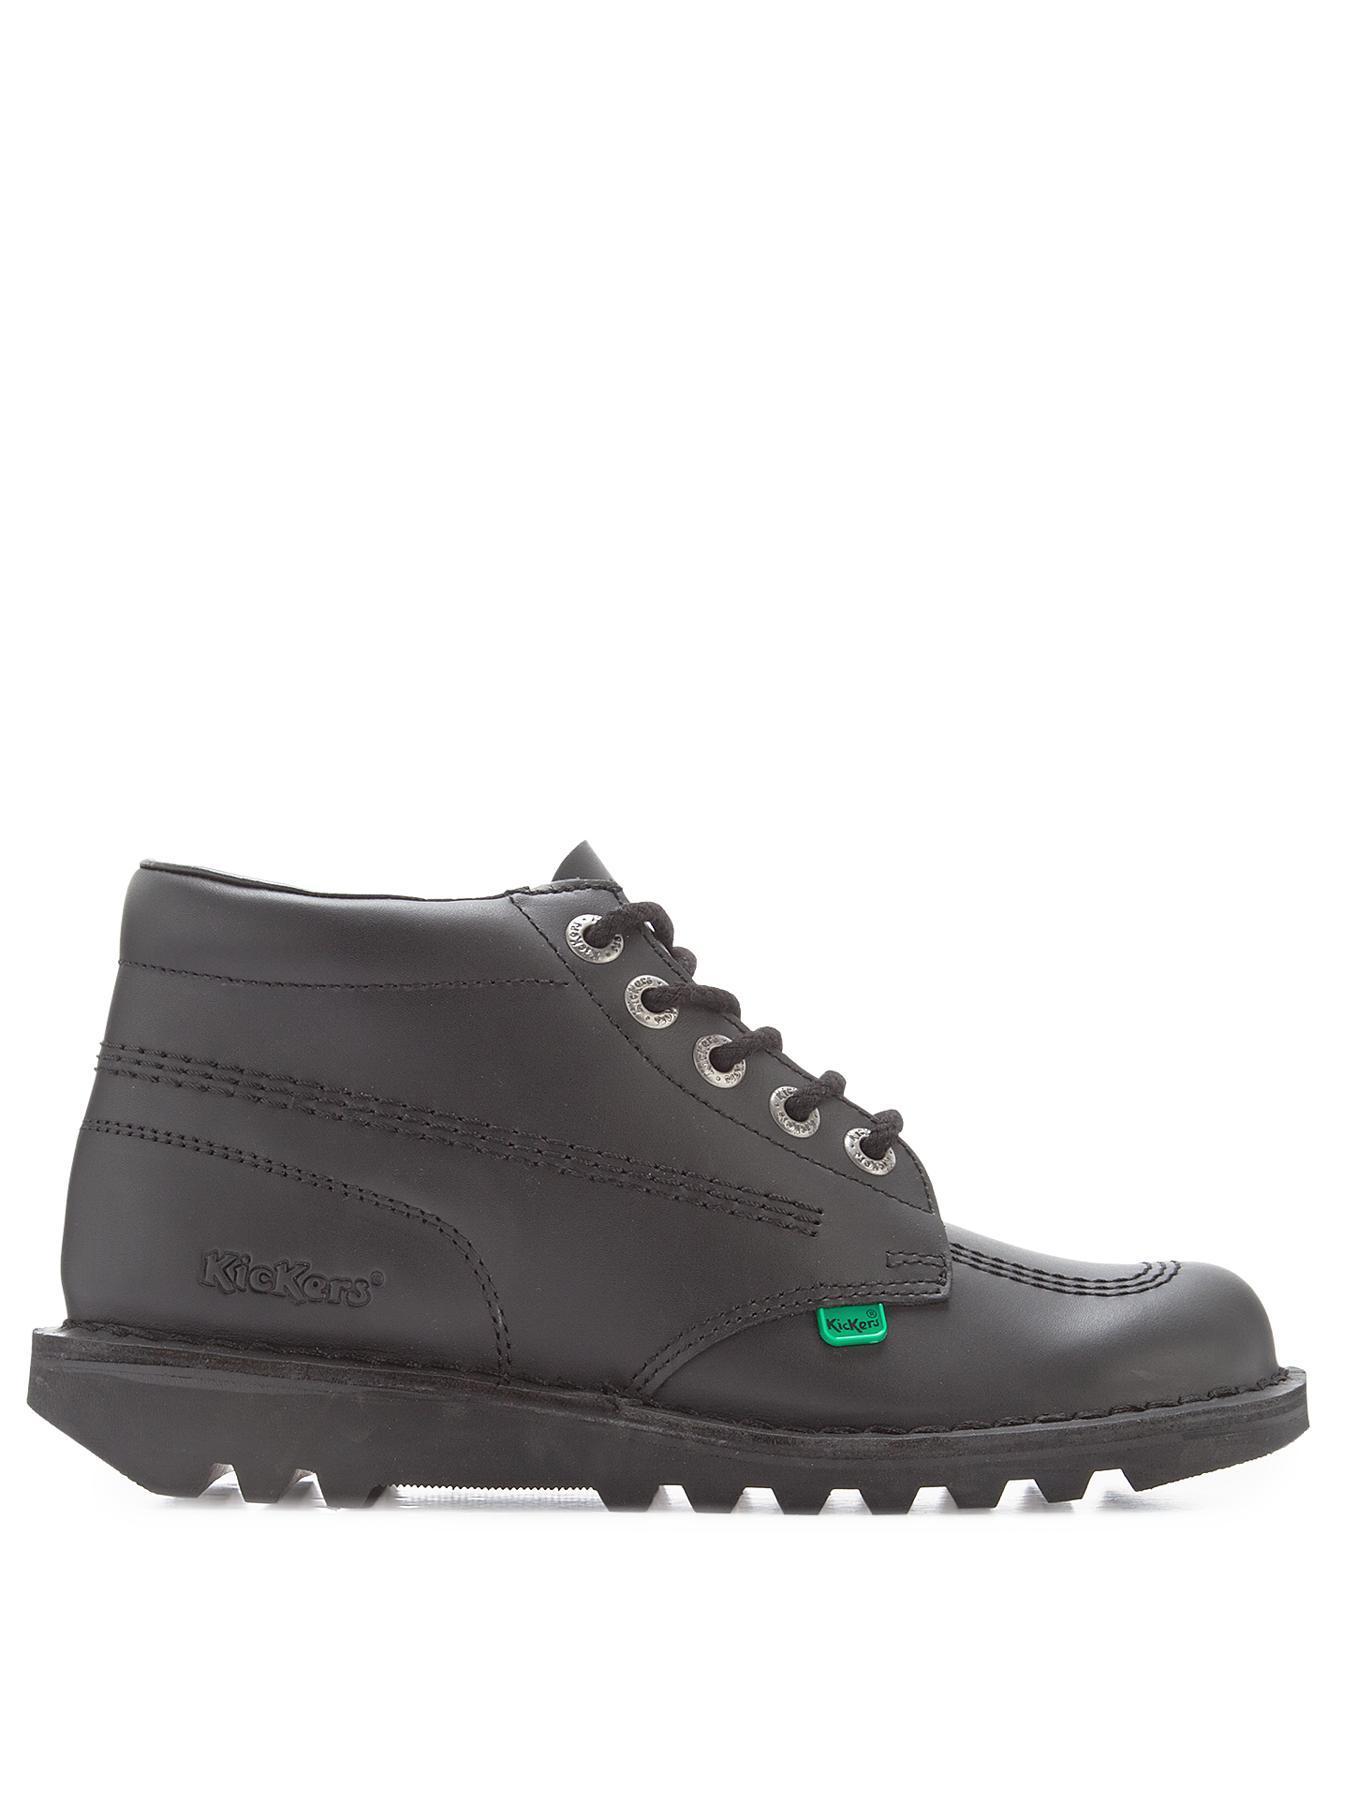 Kickers Kick Hi Mens Boots In Black For Men Lyst